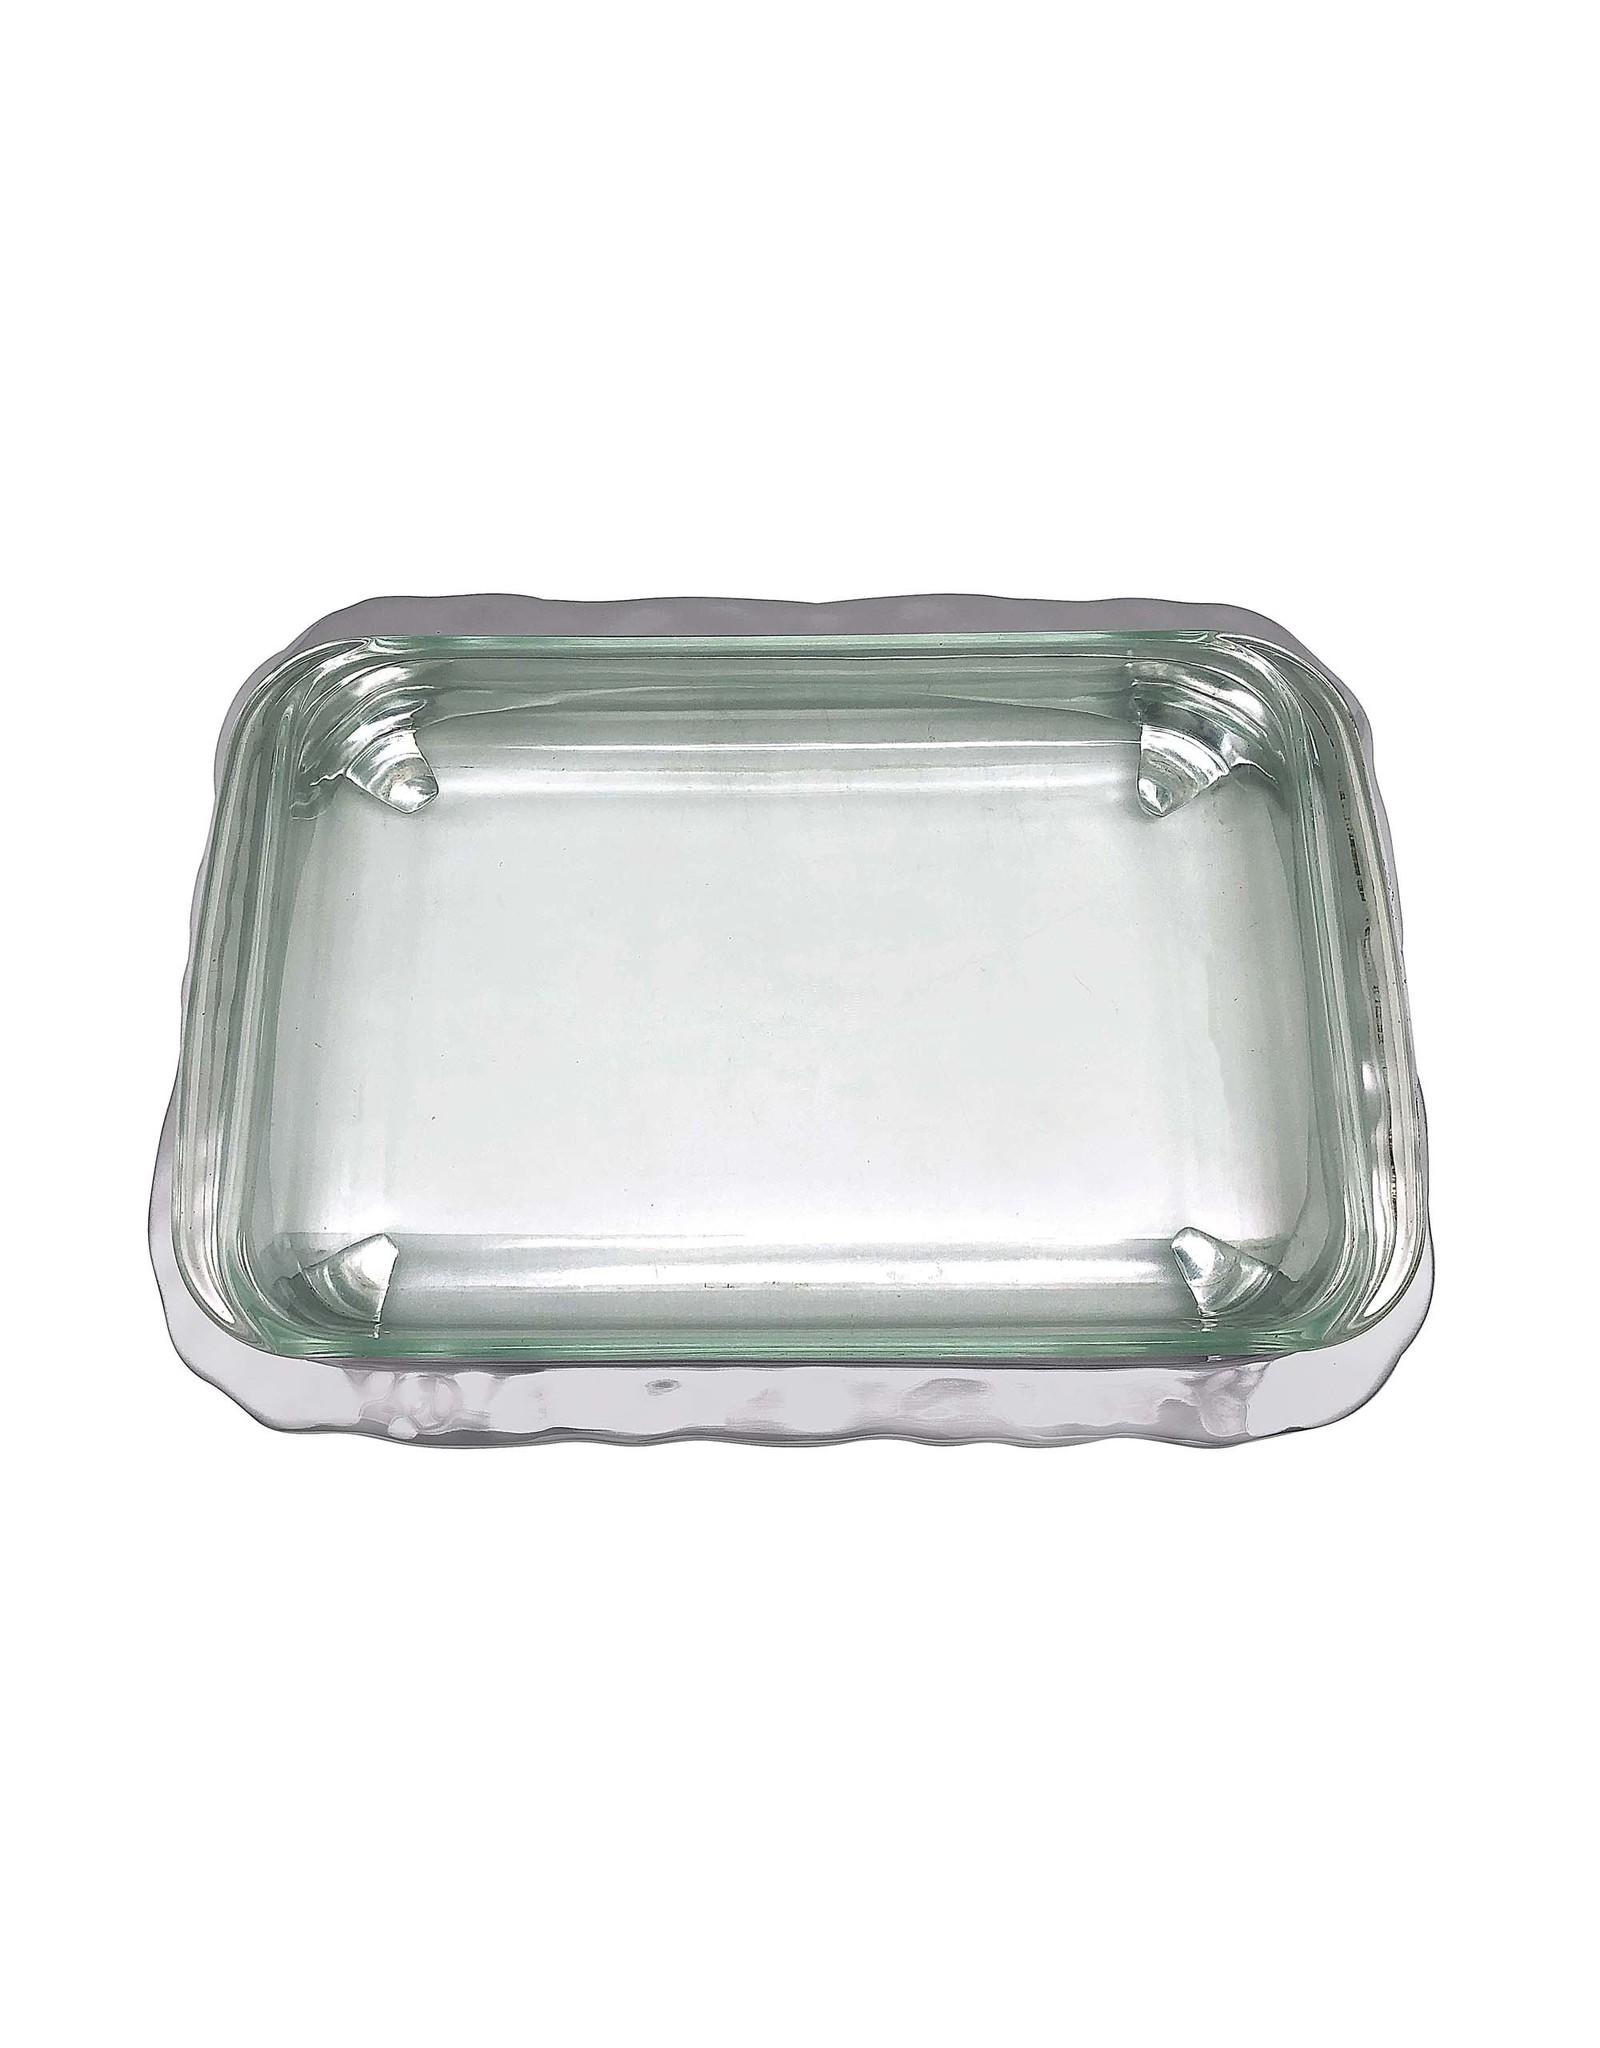 Mariposa Shimmer Oblong Casserole Dish